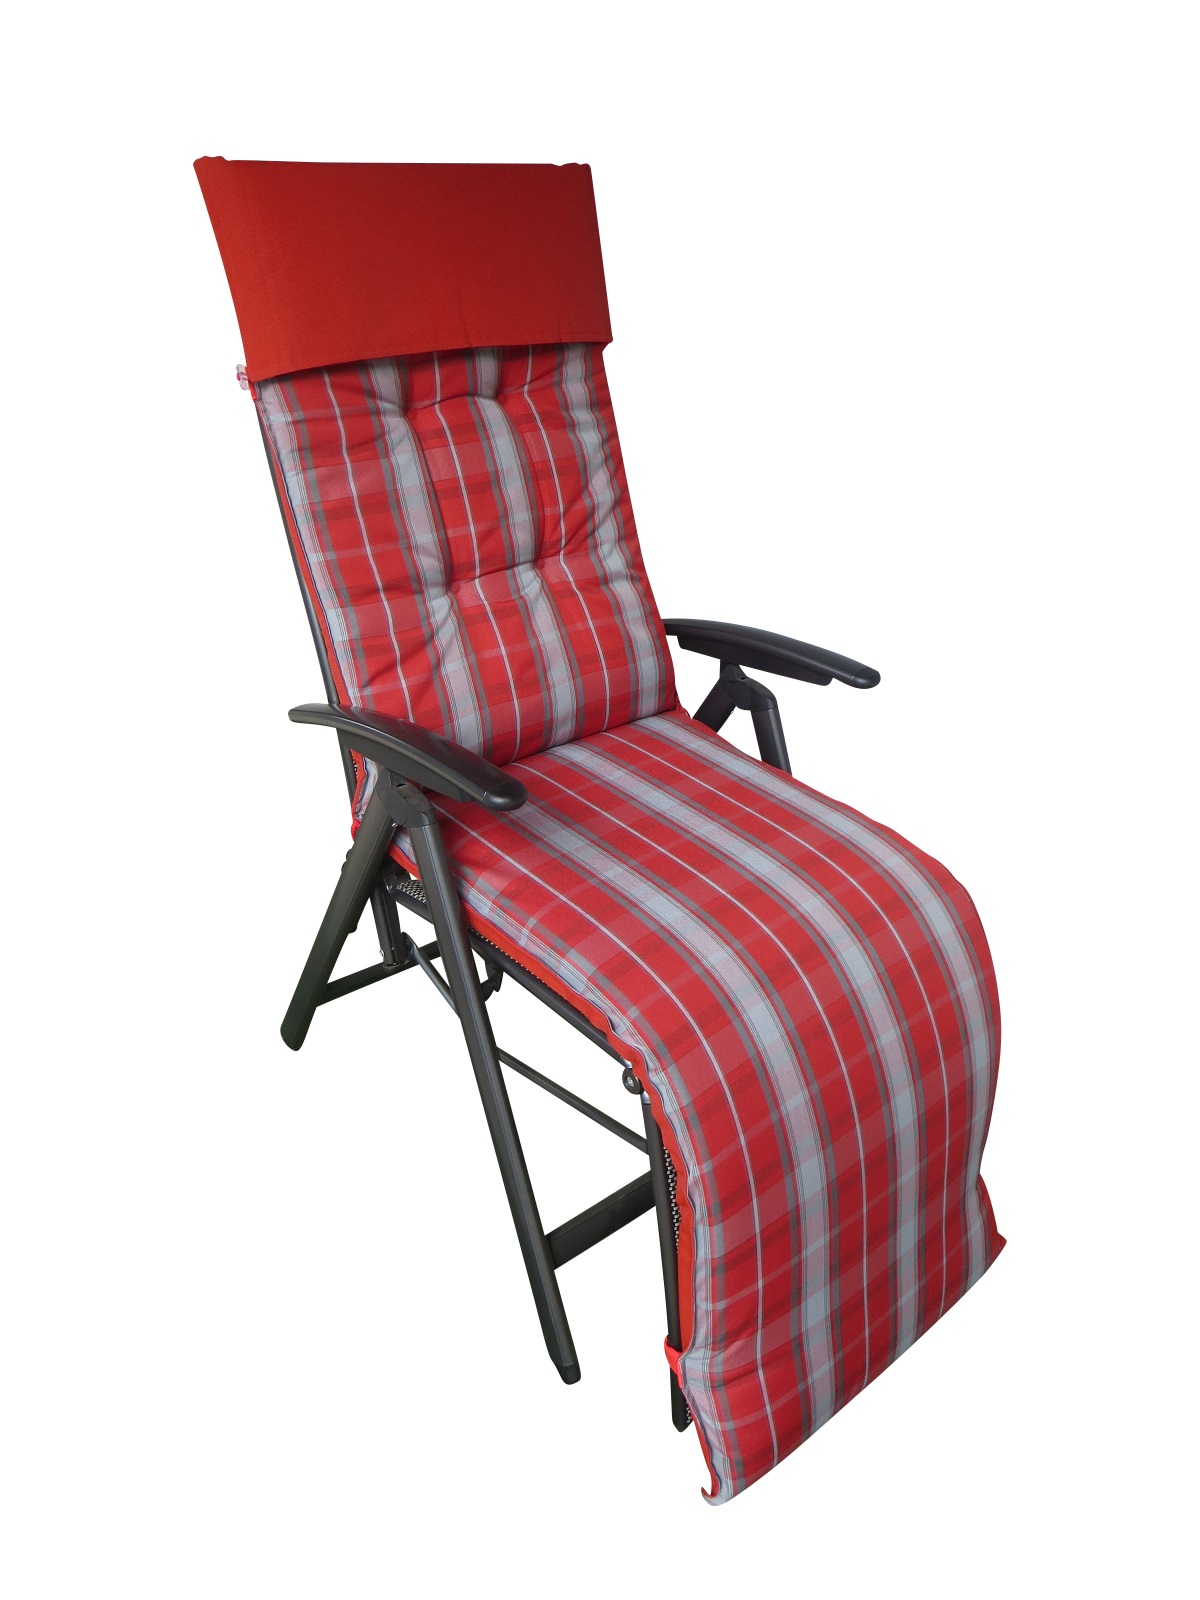 4302k relaxliegenauflage sessel 175x50x7cm rot kariert. Black Bedroom Furniture Sets. Home Design Ideas